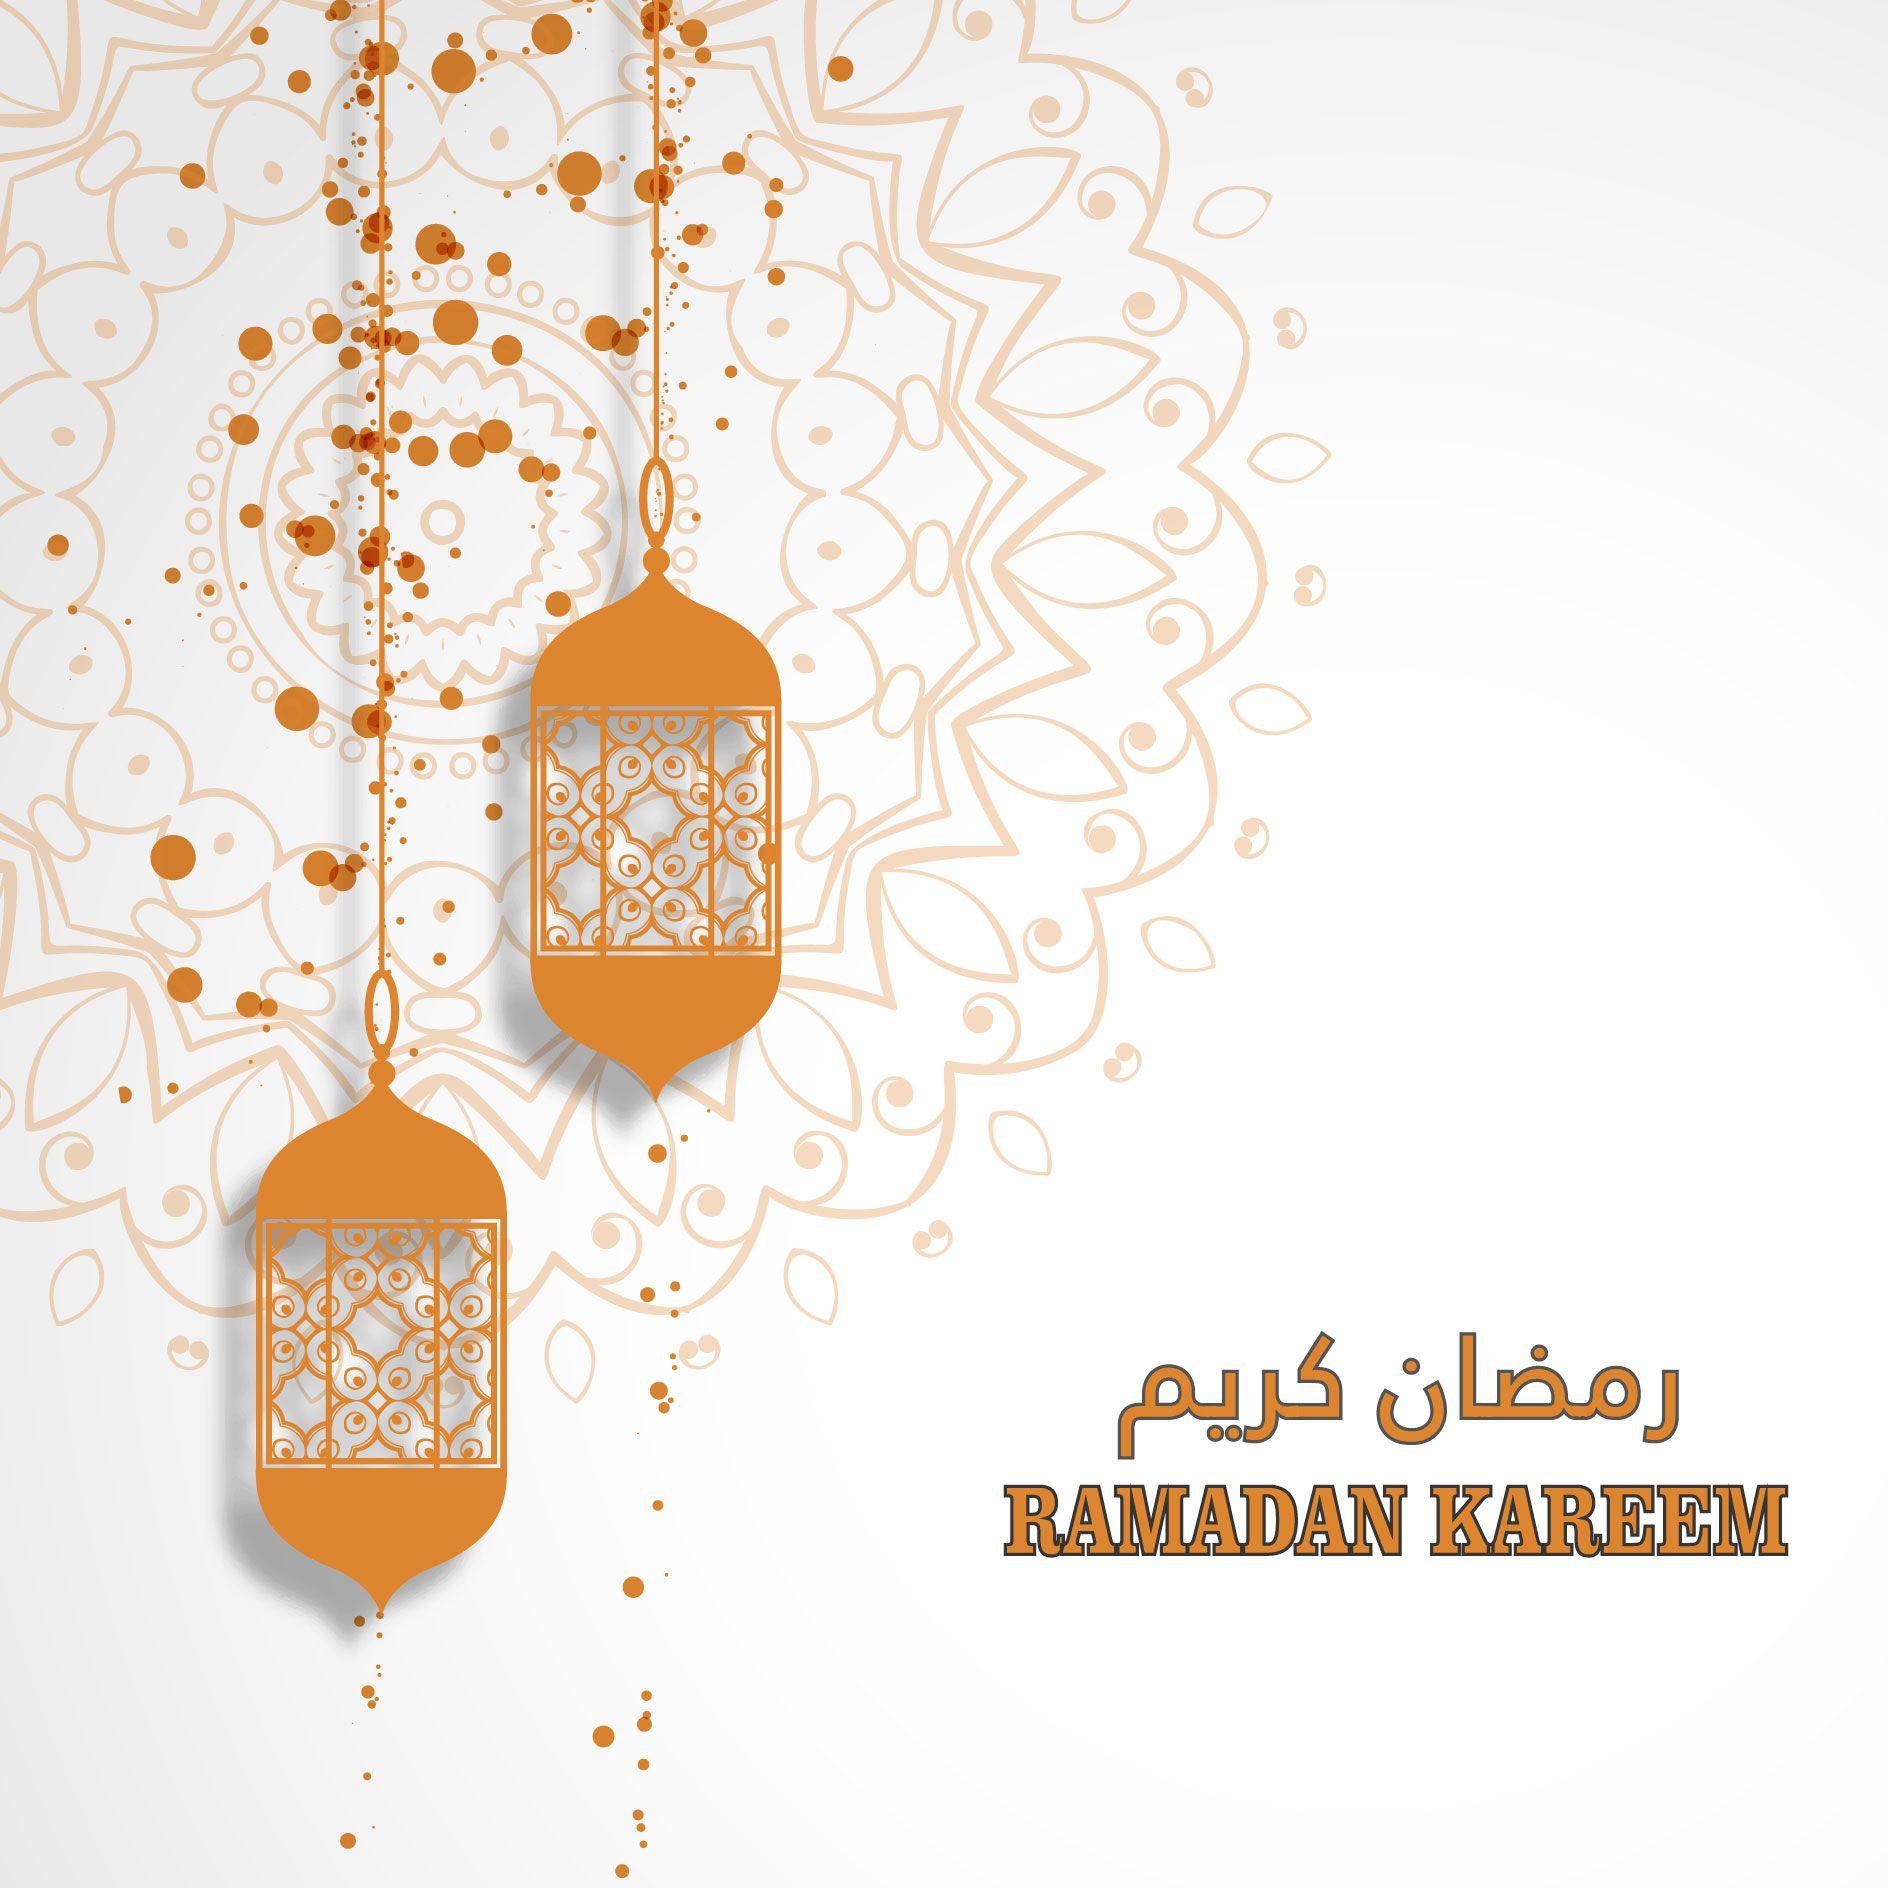 Happy Ramadan Kareem From Best Solution Advertising Advertising Services Ramadan Kareem Ramadan